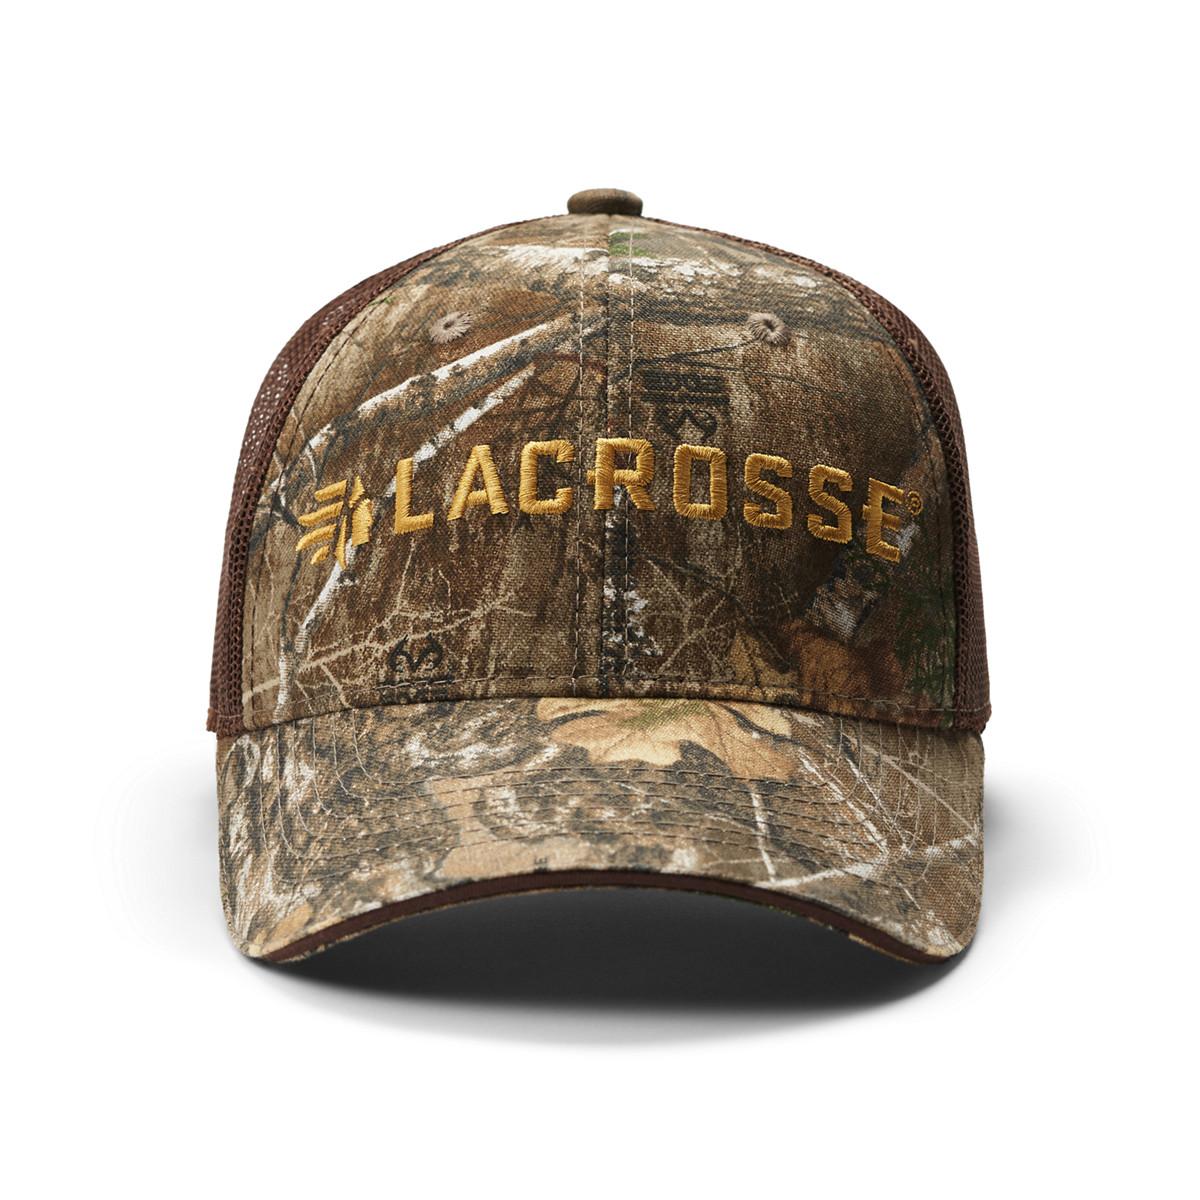 LaCrosse Camo Mesh Back Hat - Realtree Edge